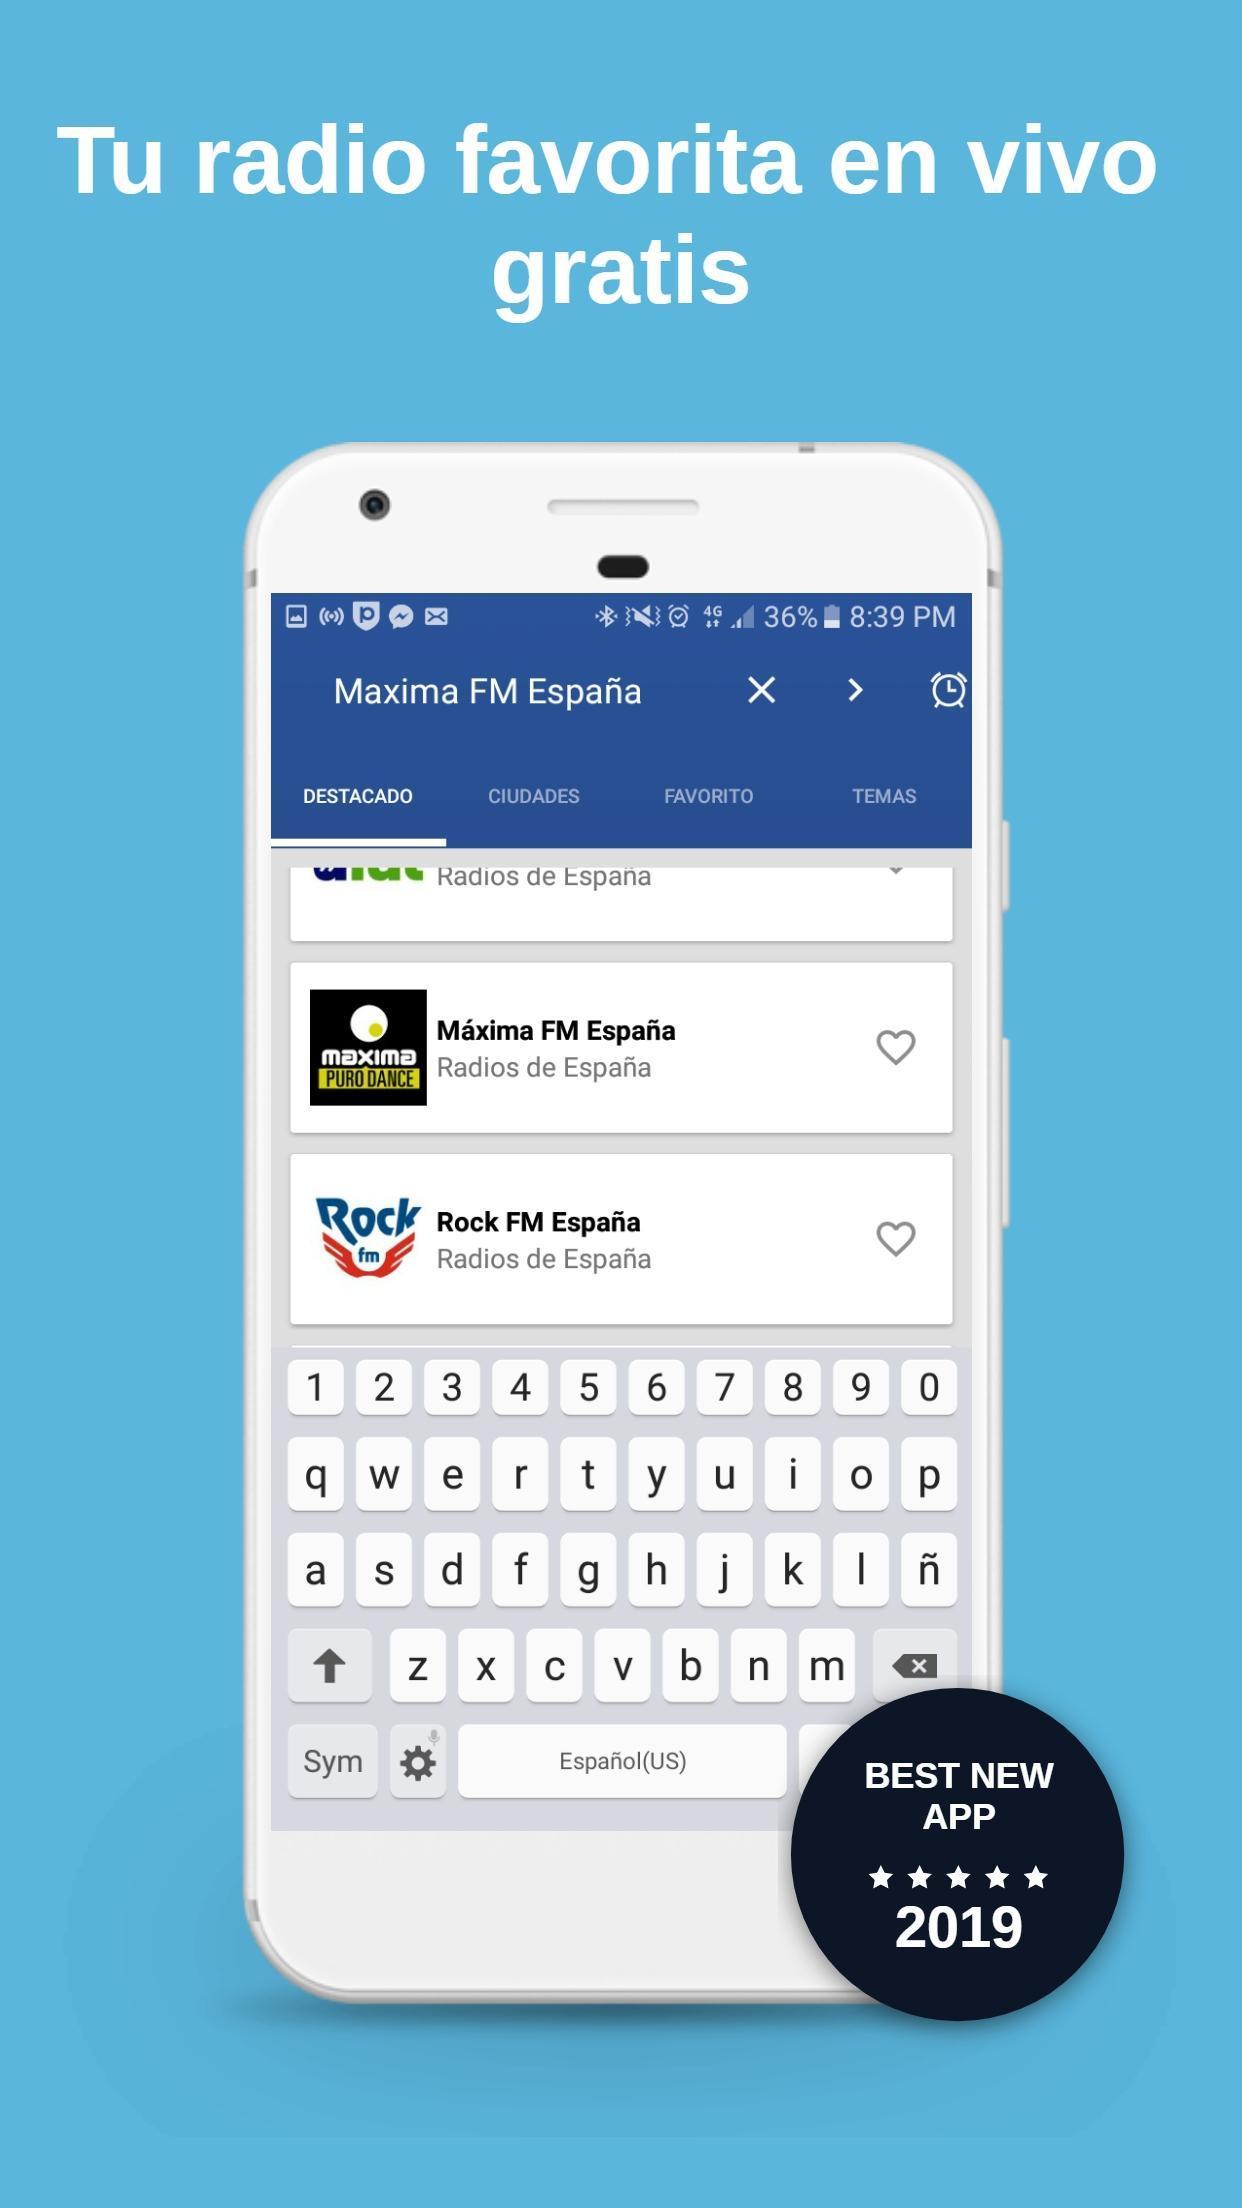 Radio España Maxima fm Dance Free for Android - APK Download